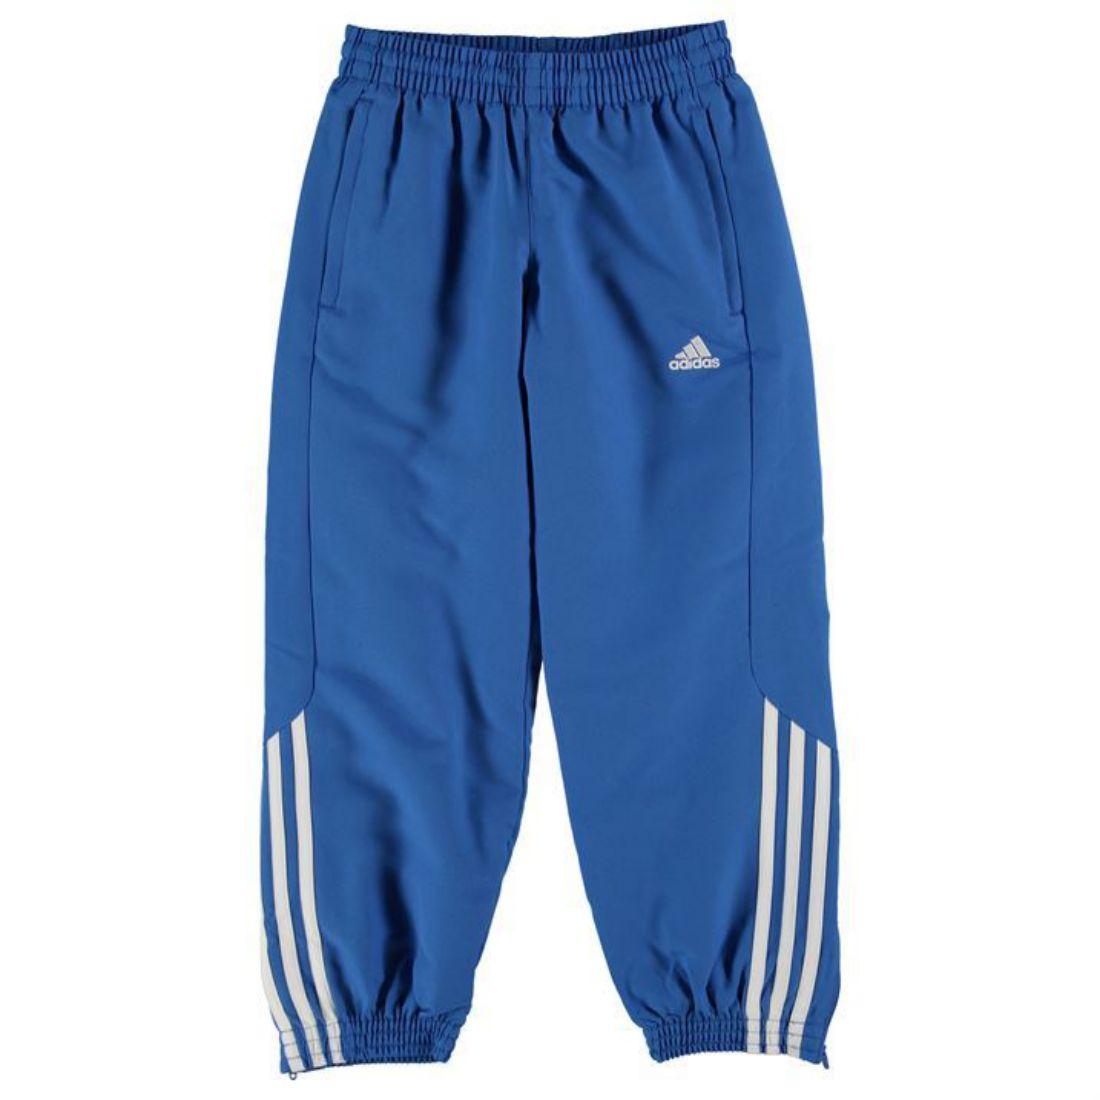 c5fcd34be44e adidas Samson 2 Sweat Pants Junior Mesh Lining Casual Boys Children 10 10  di 10 Vedi Altro